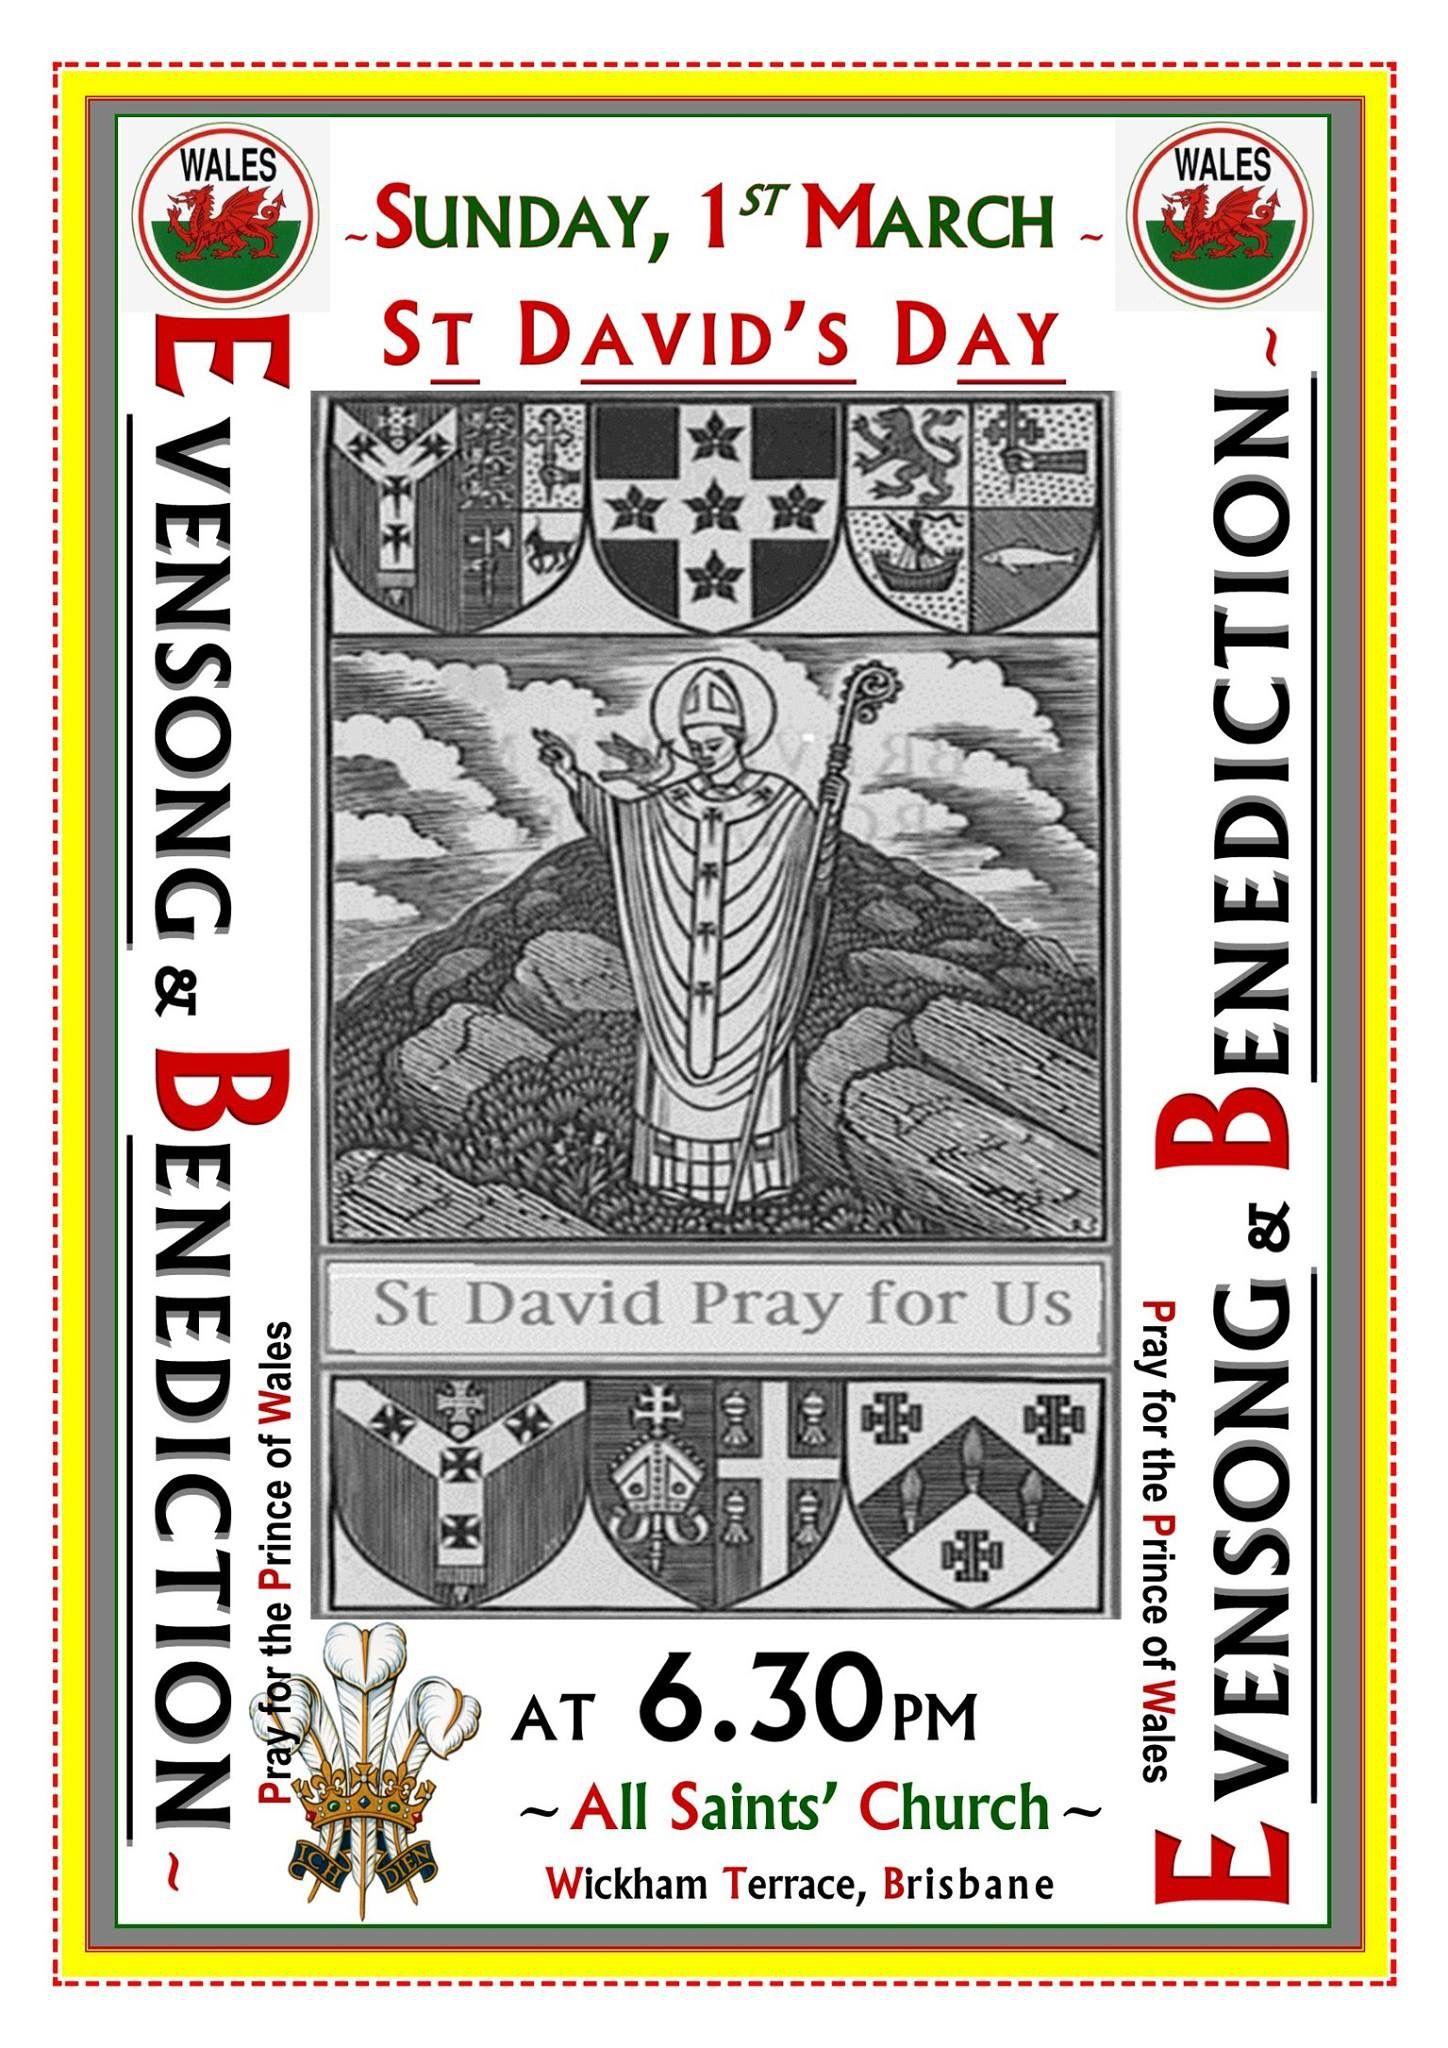 1 3 2015 happy st david s day pictorial calendar 2015 pinterest